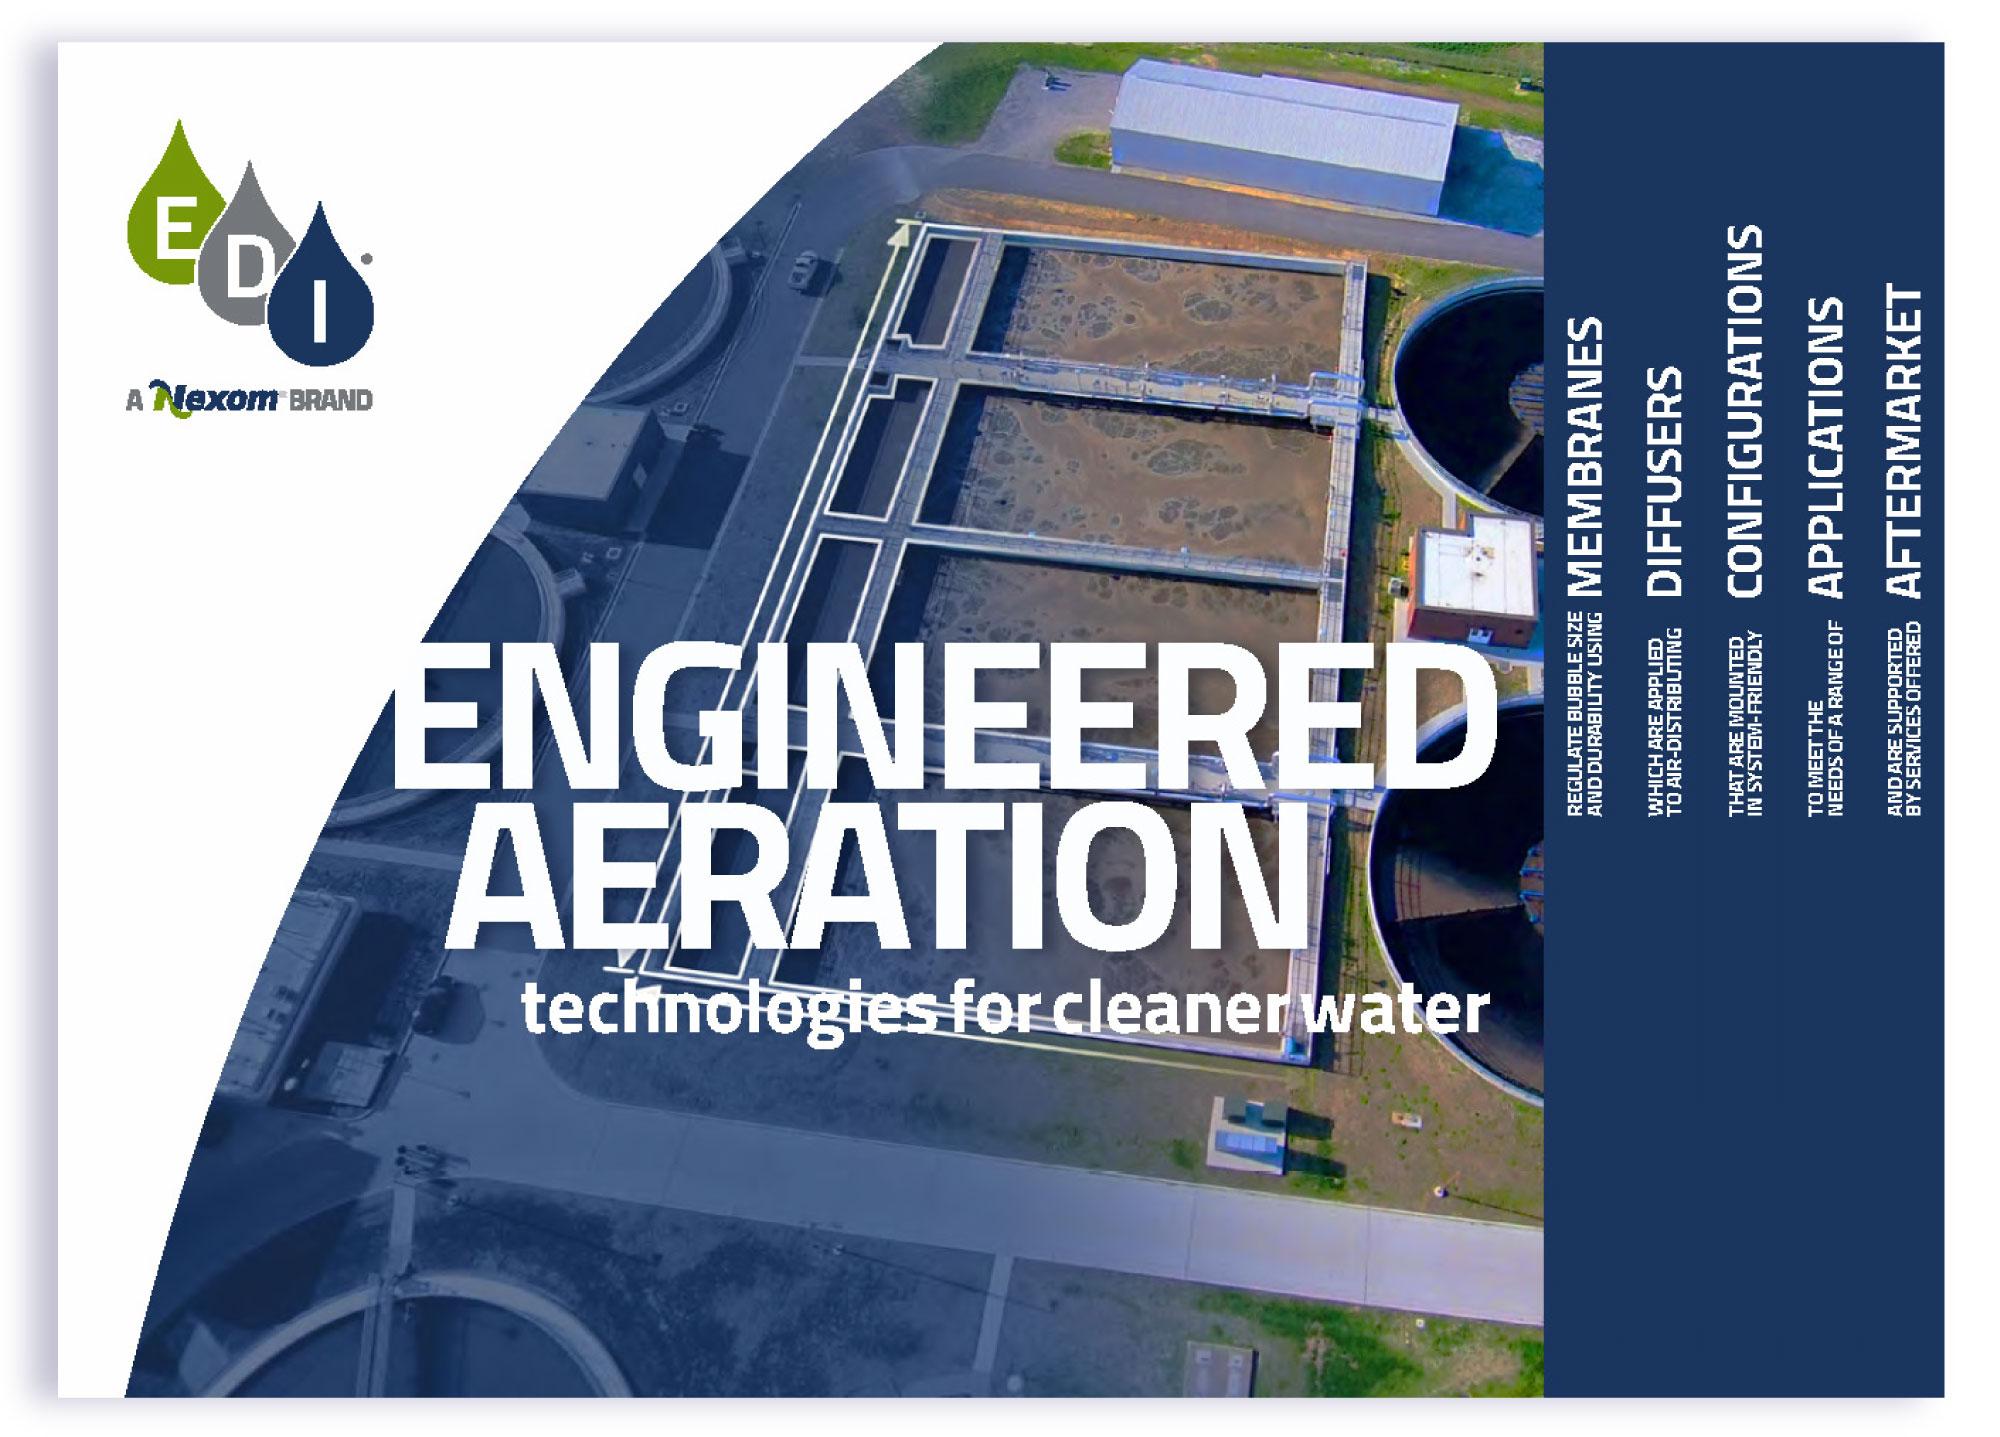 Engineered-Aeration-Image